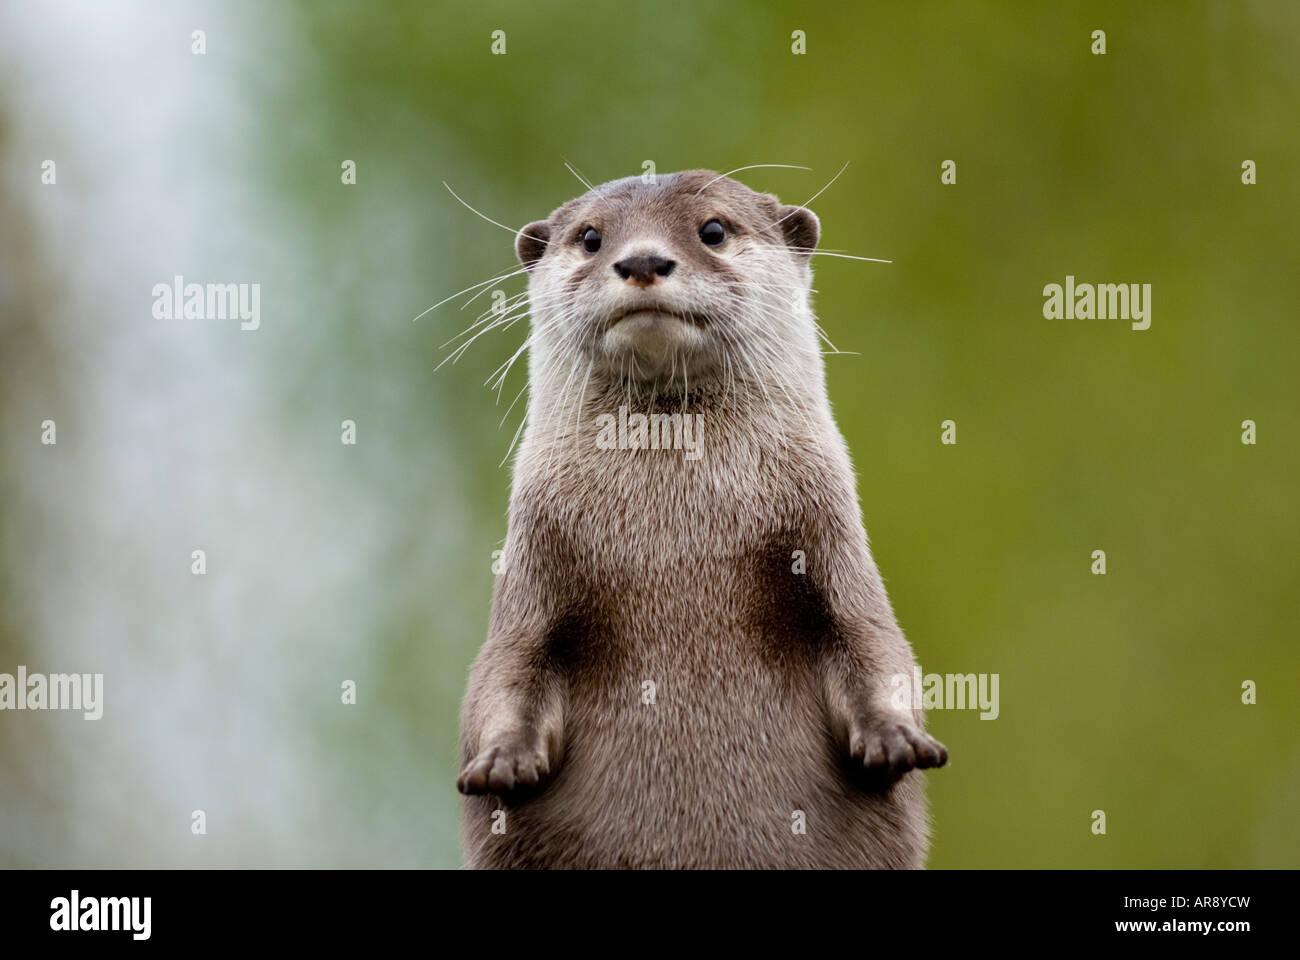 ASIATISCHE SHORT-CLAWED OTTER Amblonyx cinerea Stockbild